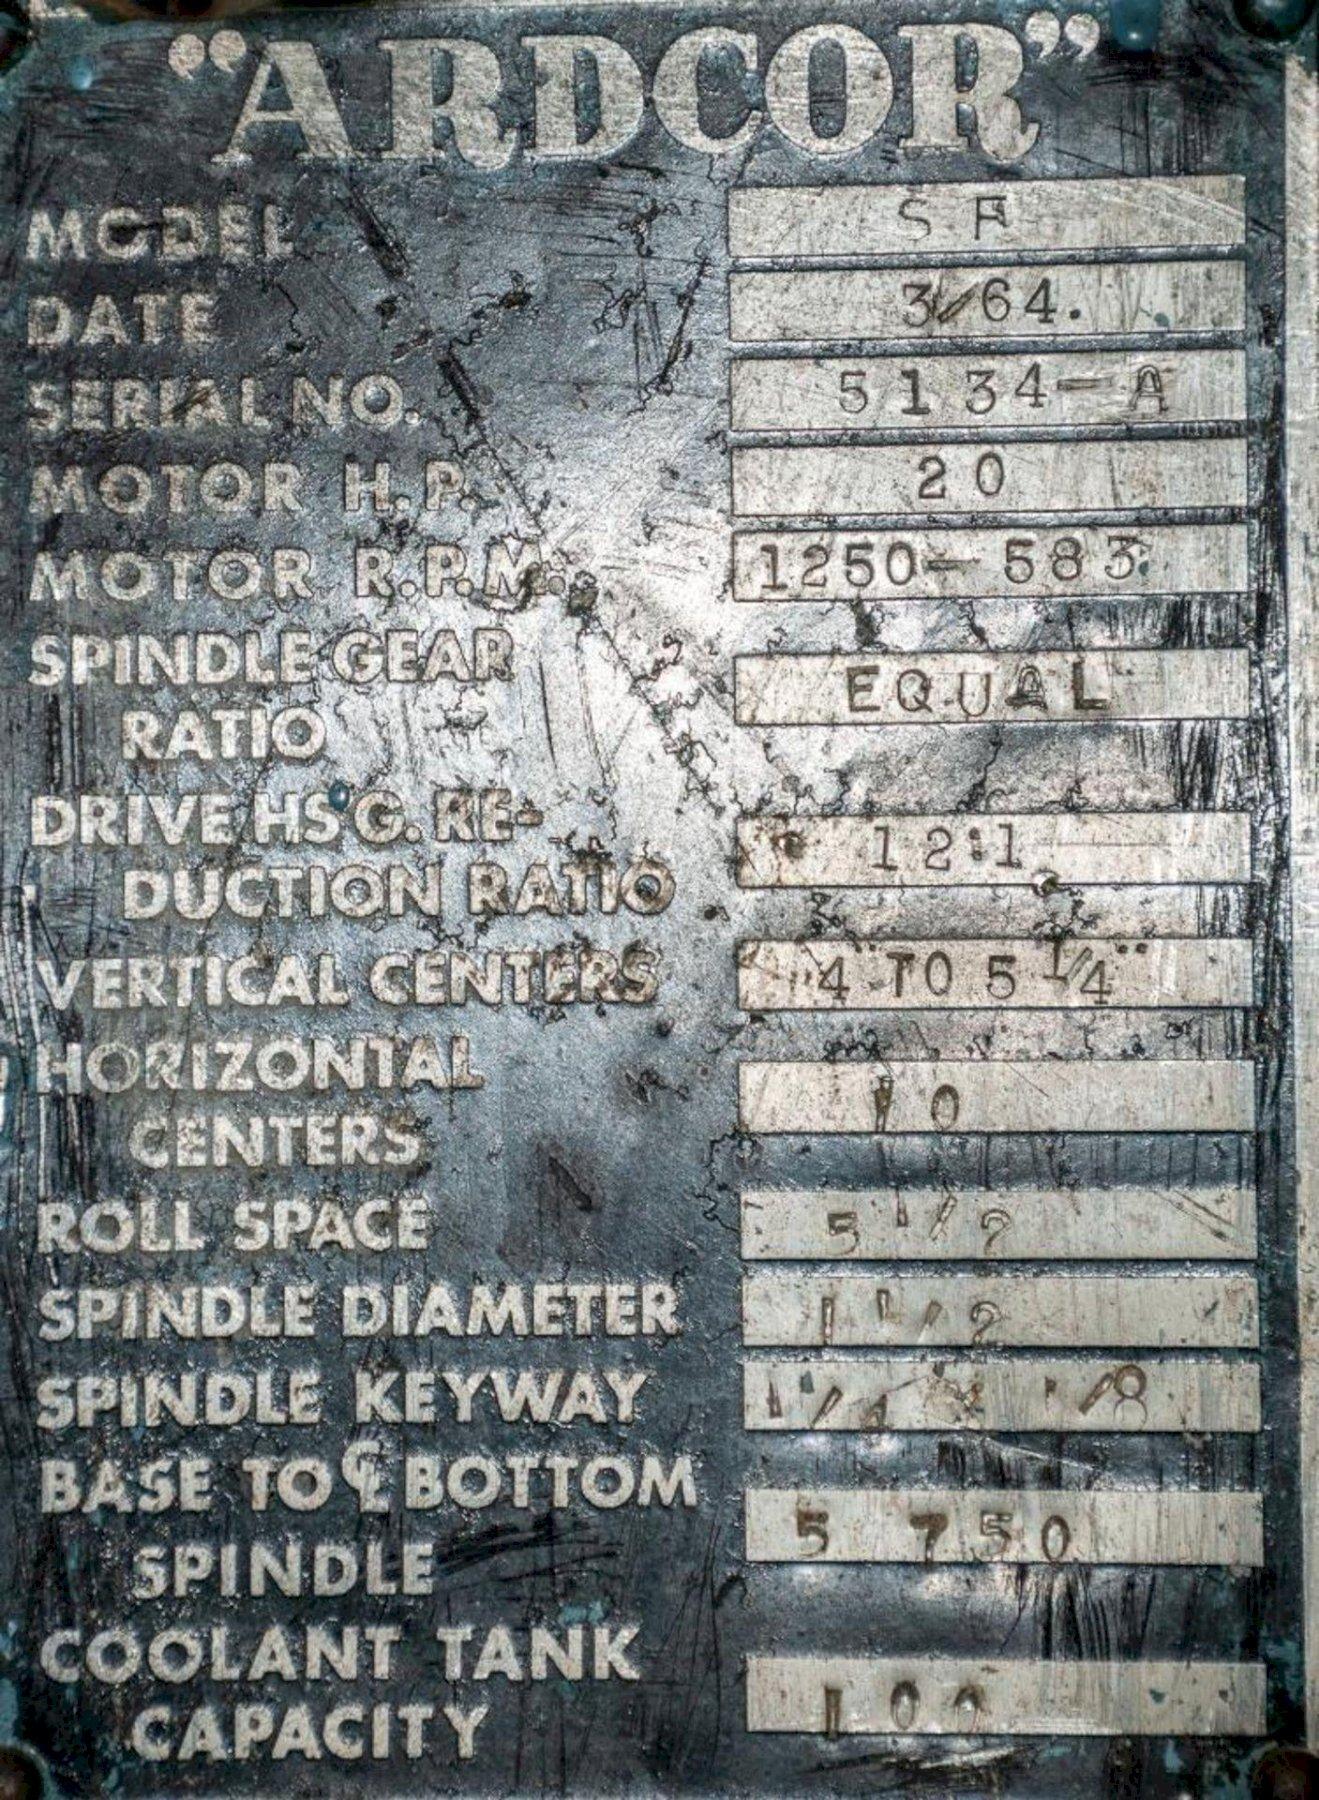 "12 STAND X 1.5"" ARDCOR MODEL F ROLLFORMER: STOCK #15342"